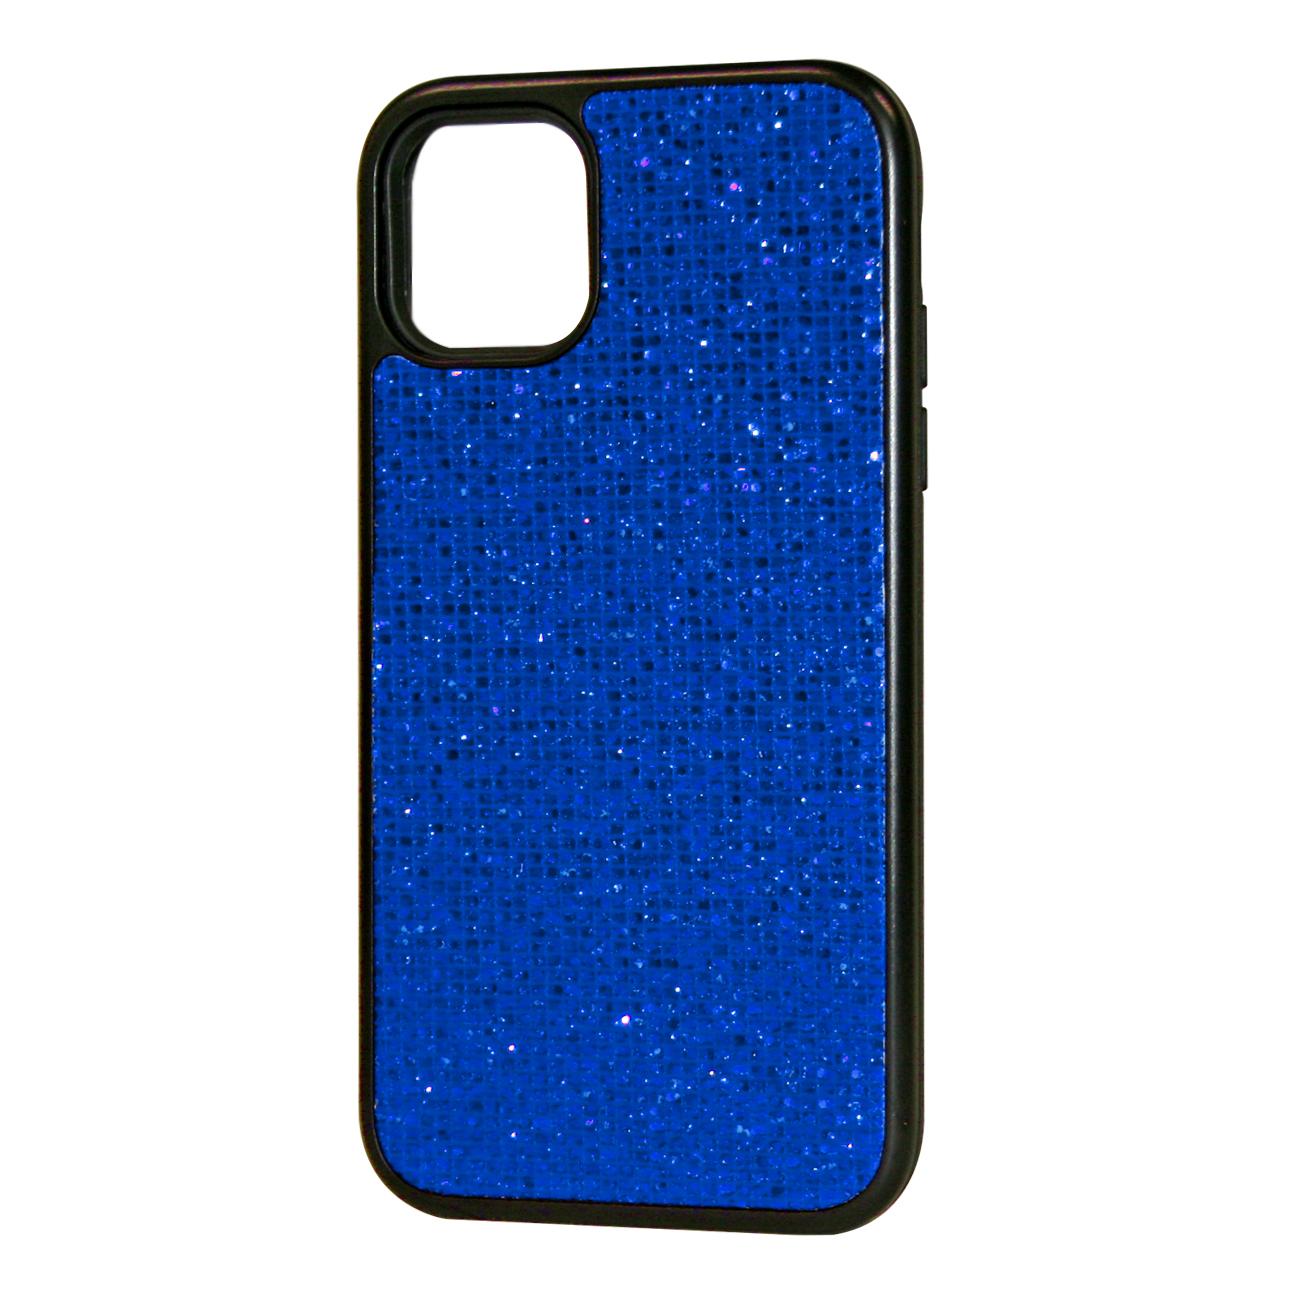 Reiko DIAMOND RHINESTONE Case For APPLE IPHONE 11 In Blue PC11-IPHONE11BL